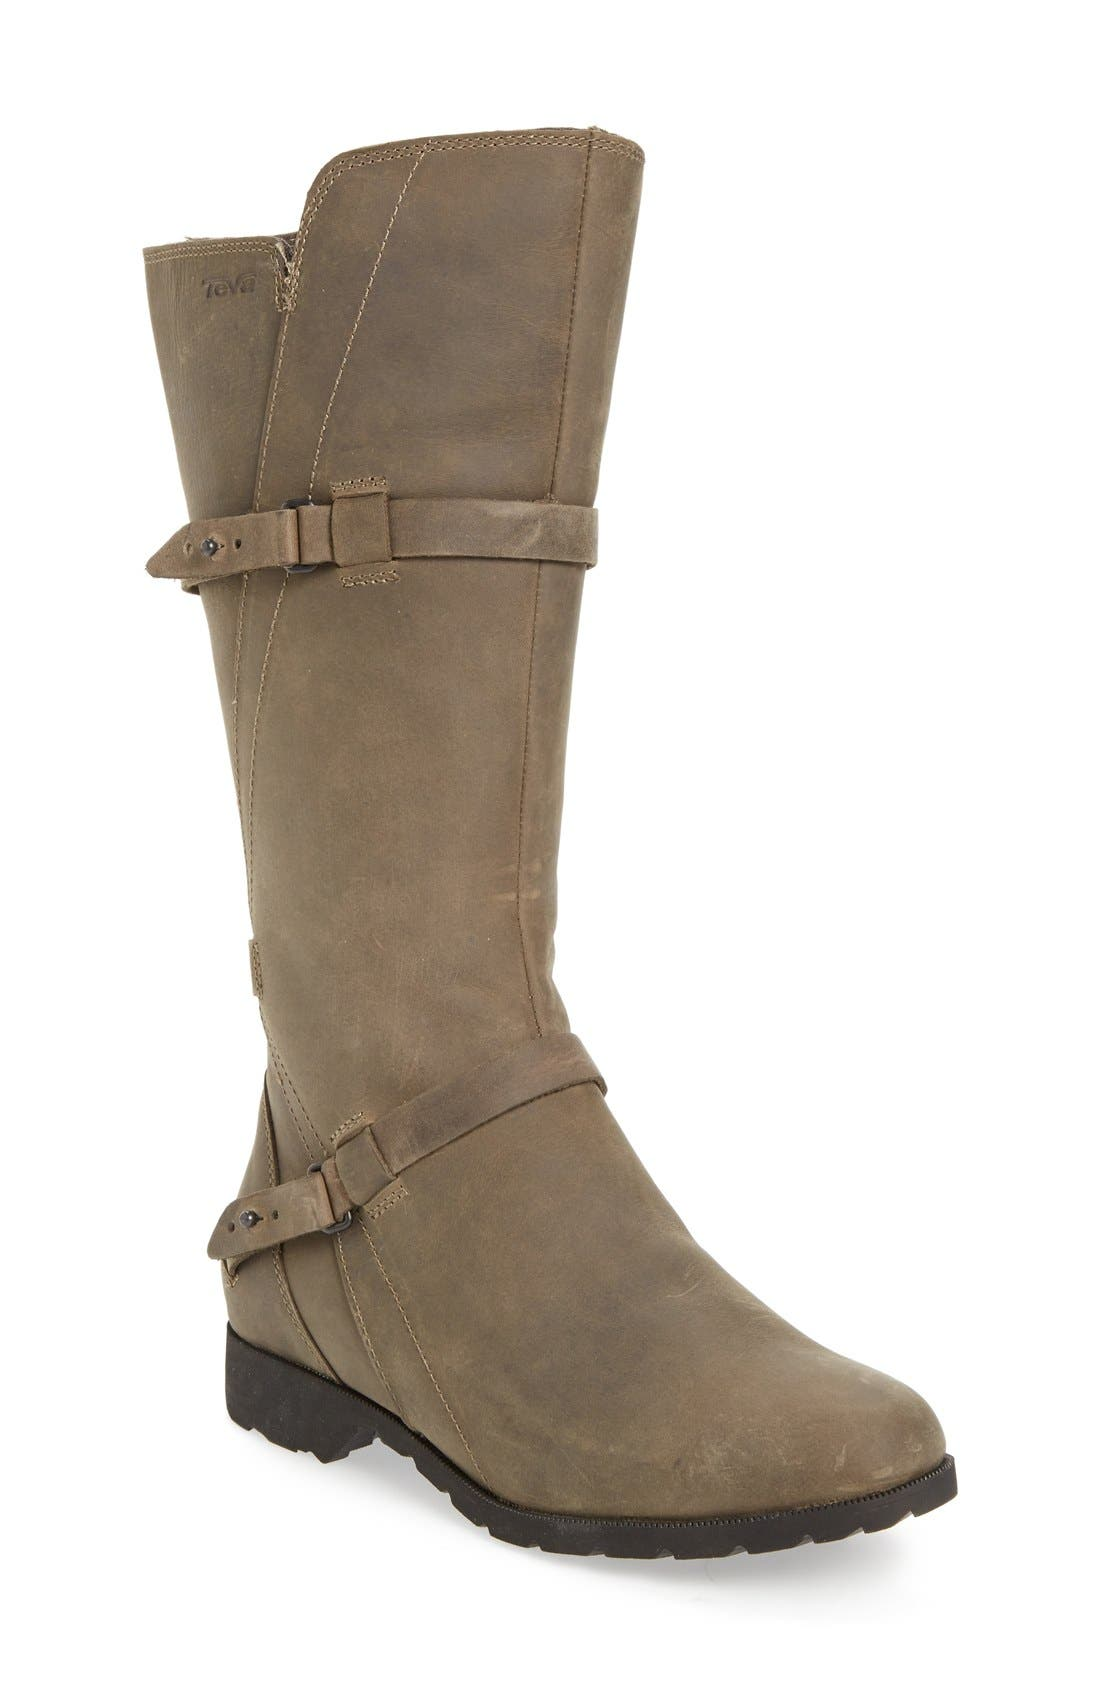 Main Image - Teva 'De La Vina' Waterproof Riding Boot (Women)